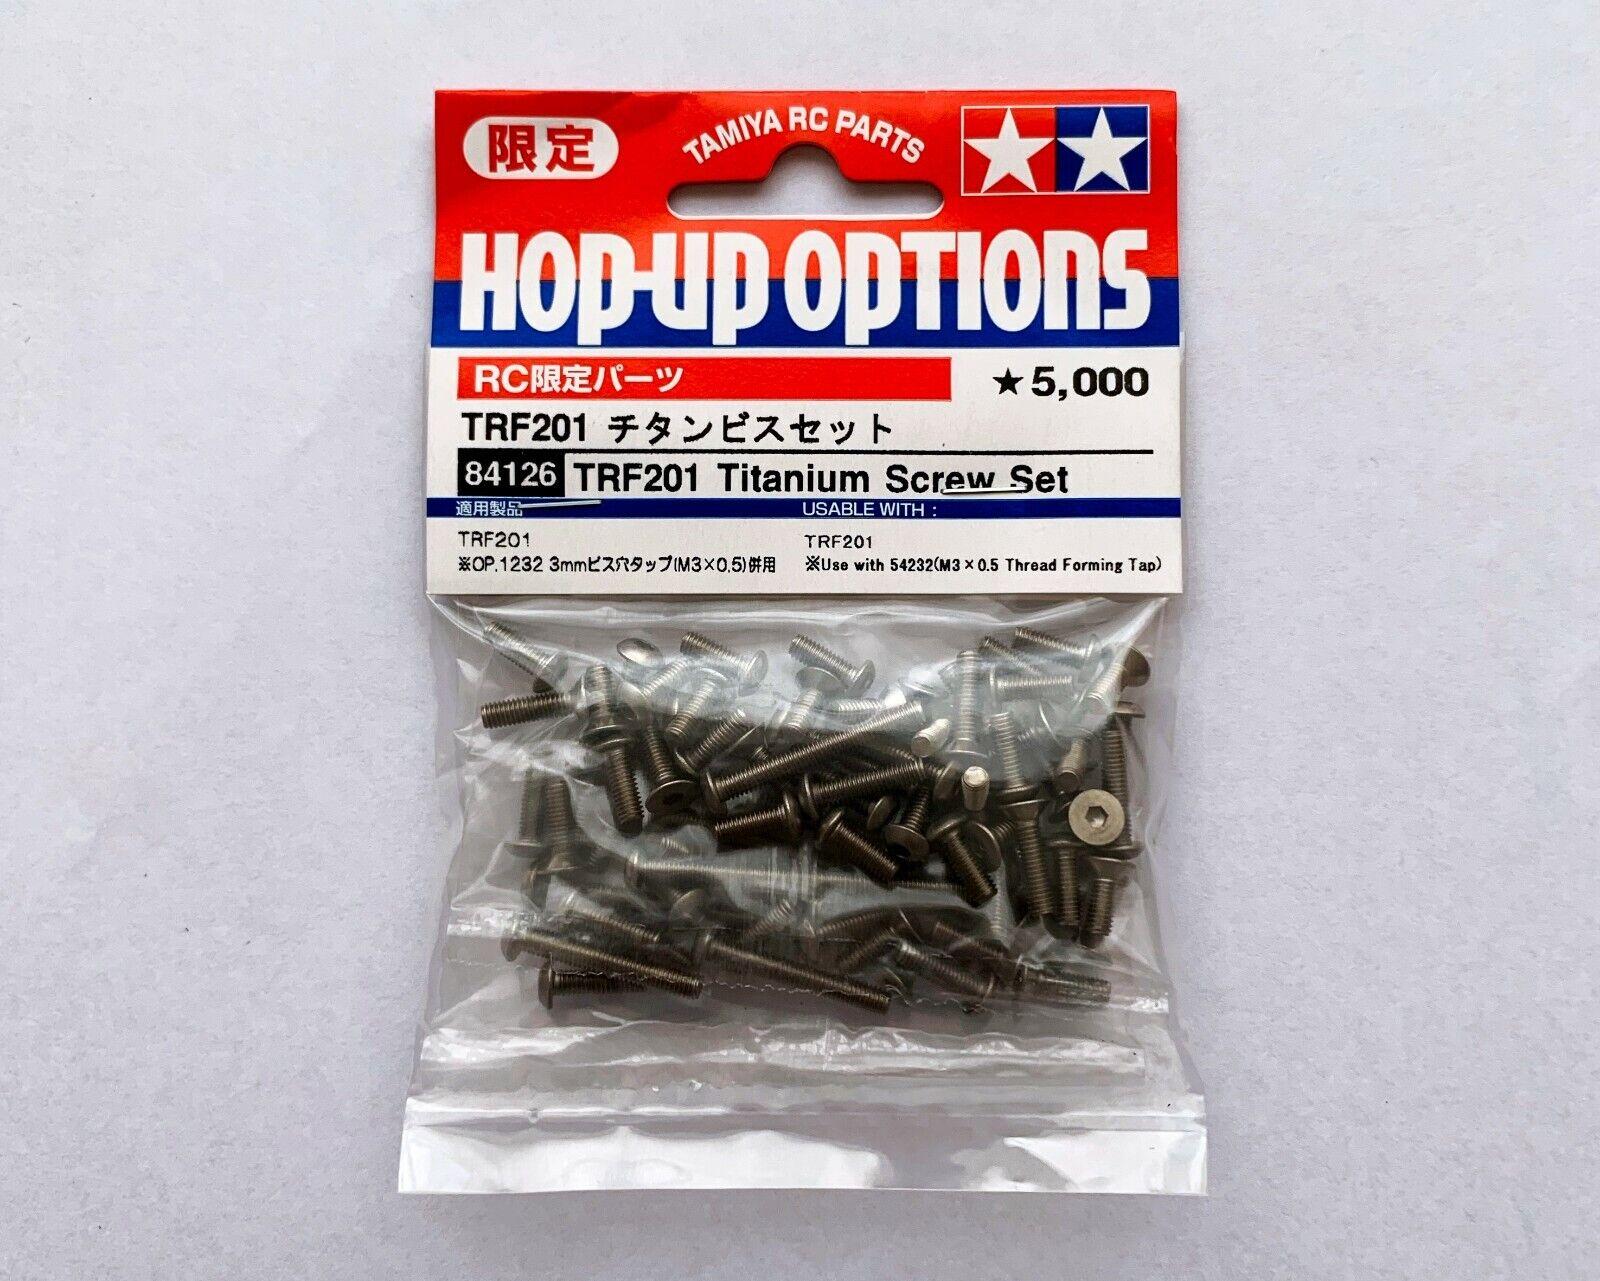 Tamiya TRF201 Titanium screw set 84126 (RC limited series)